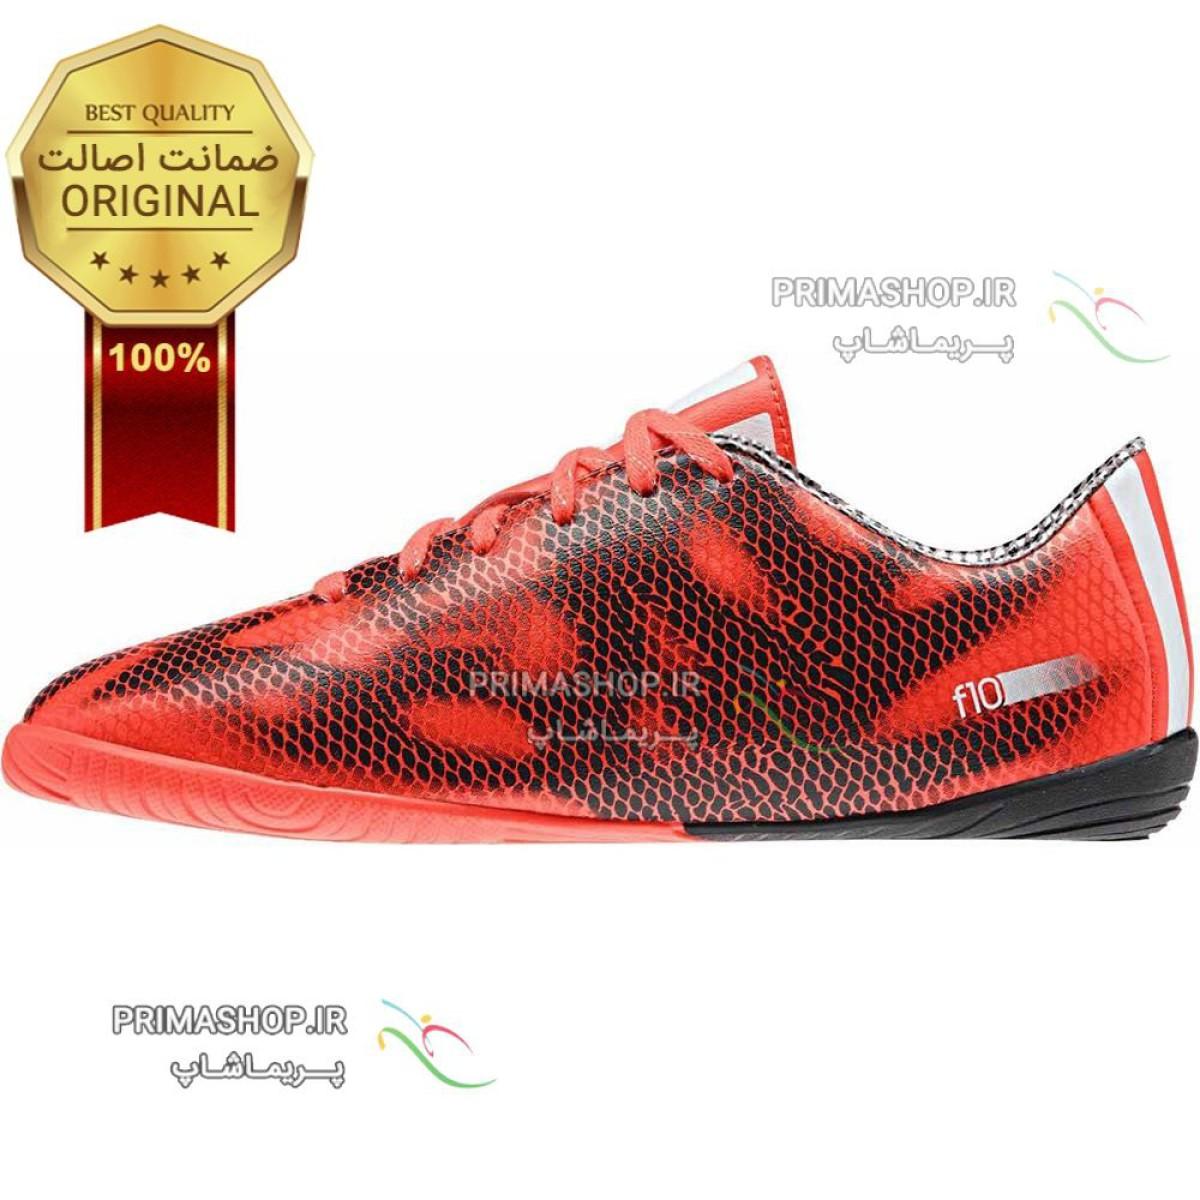 کفش فوتسال آدیداس اف 10مشکی نارنجی اورجینال adidas F10 indoor